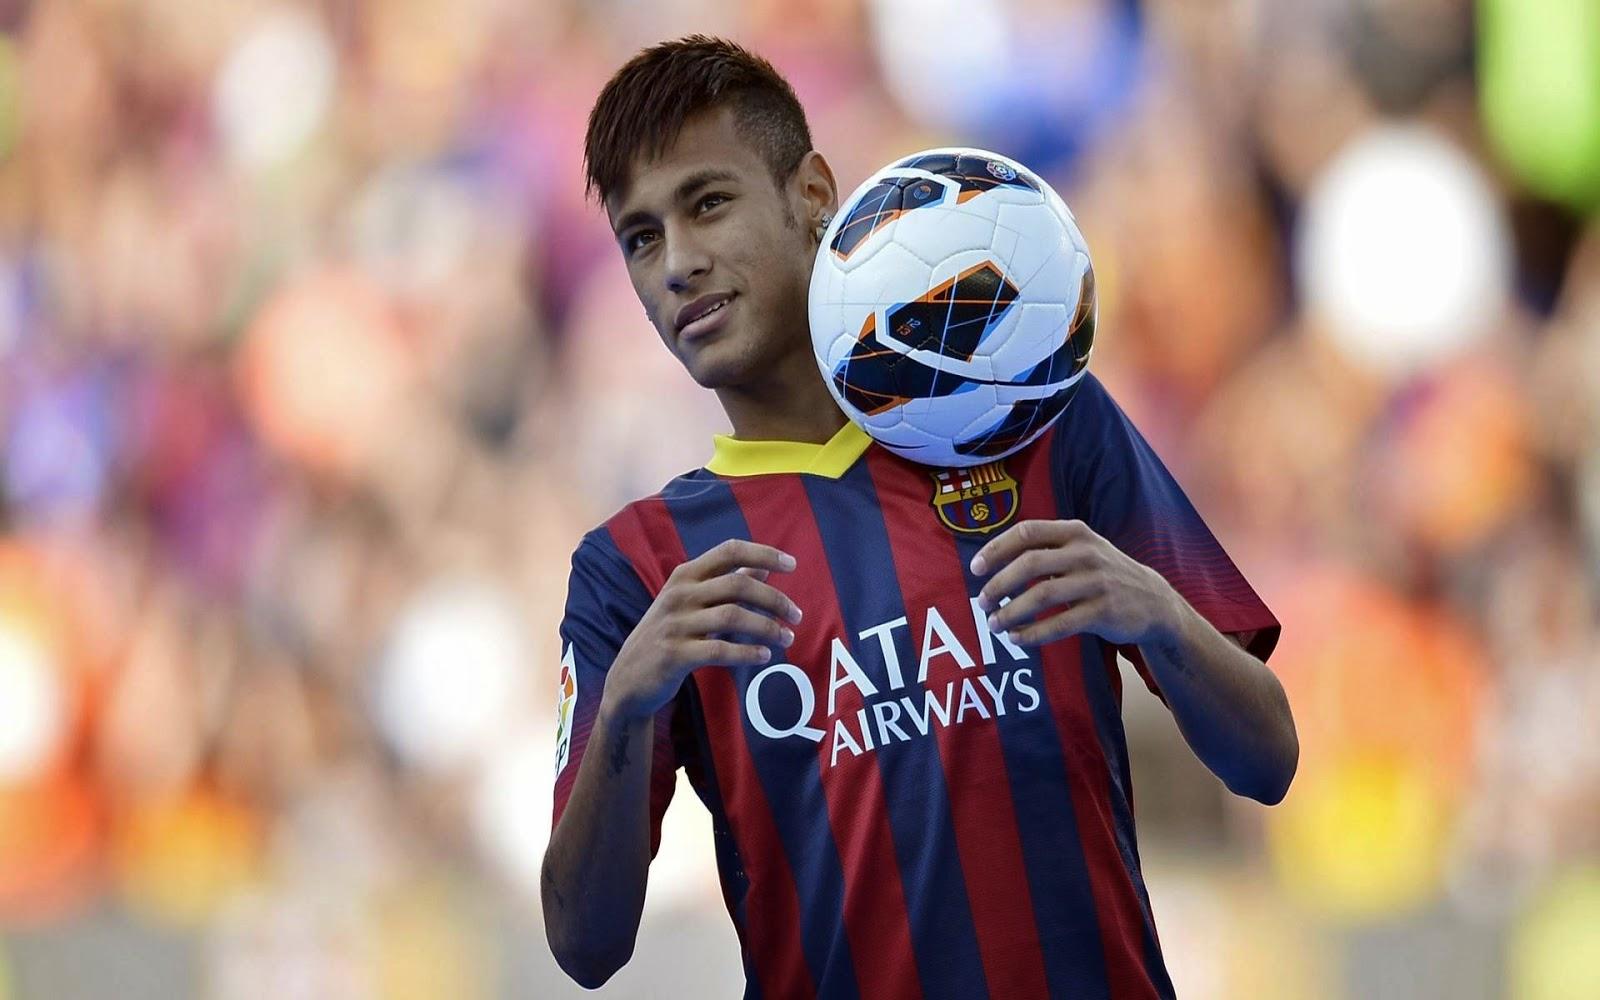 Neymar Barcelona 2015 - نيمار البرازيلي مع برشلونة